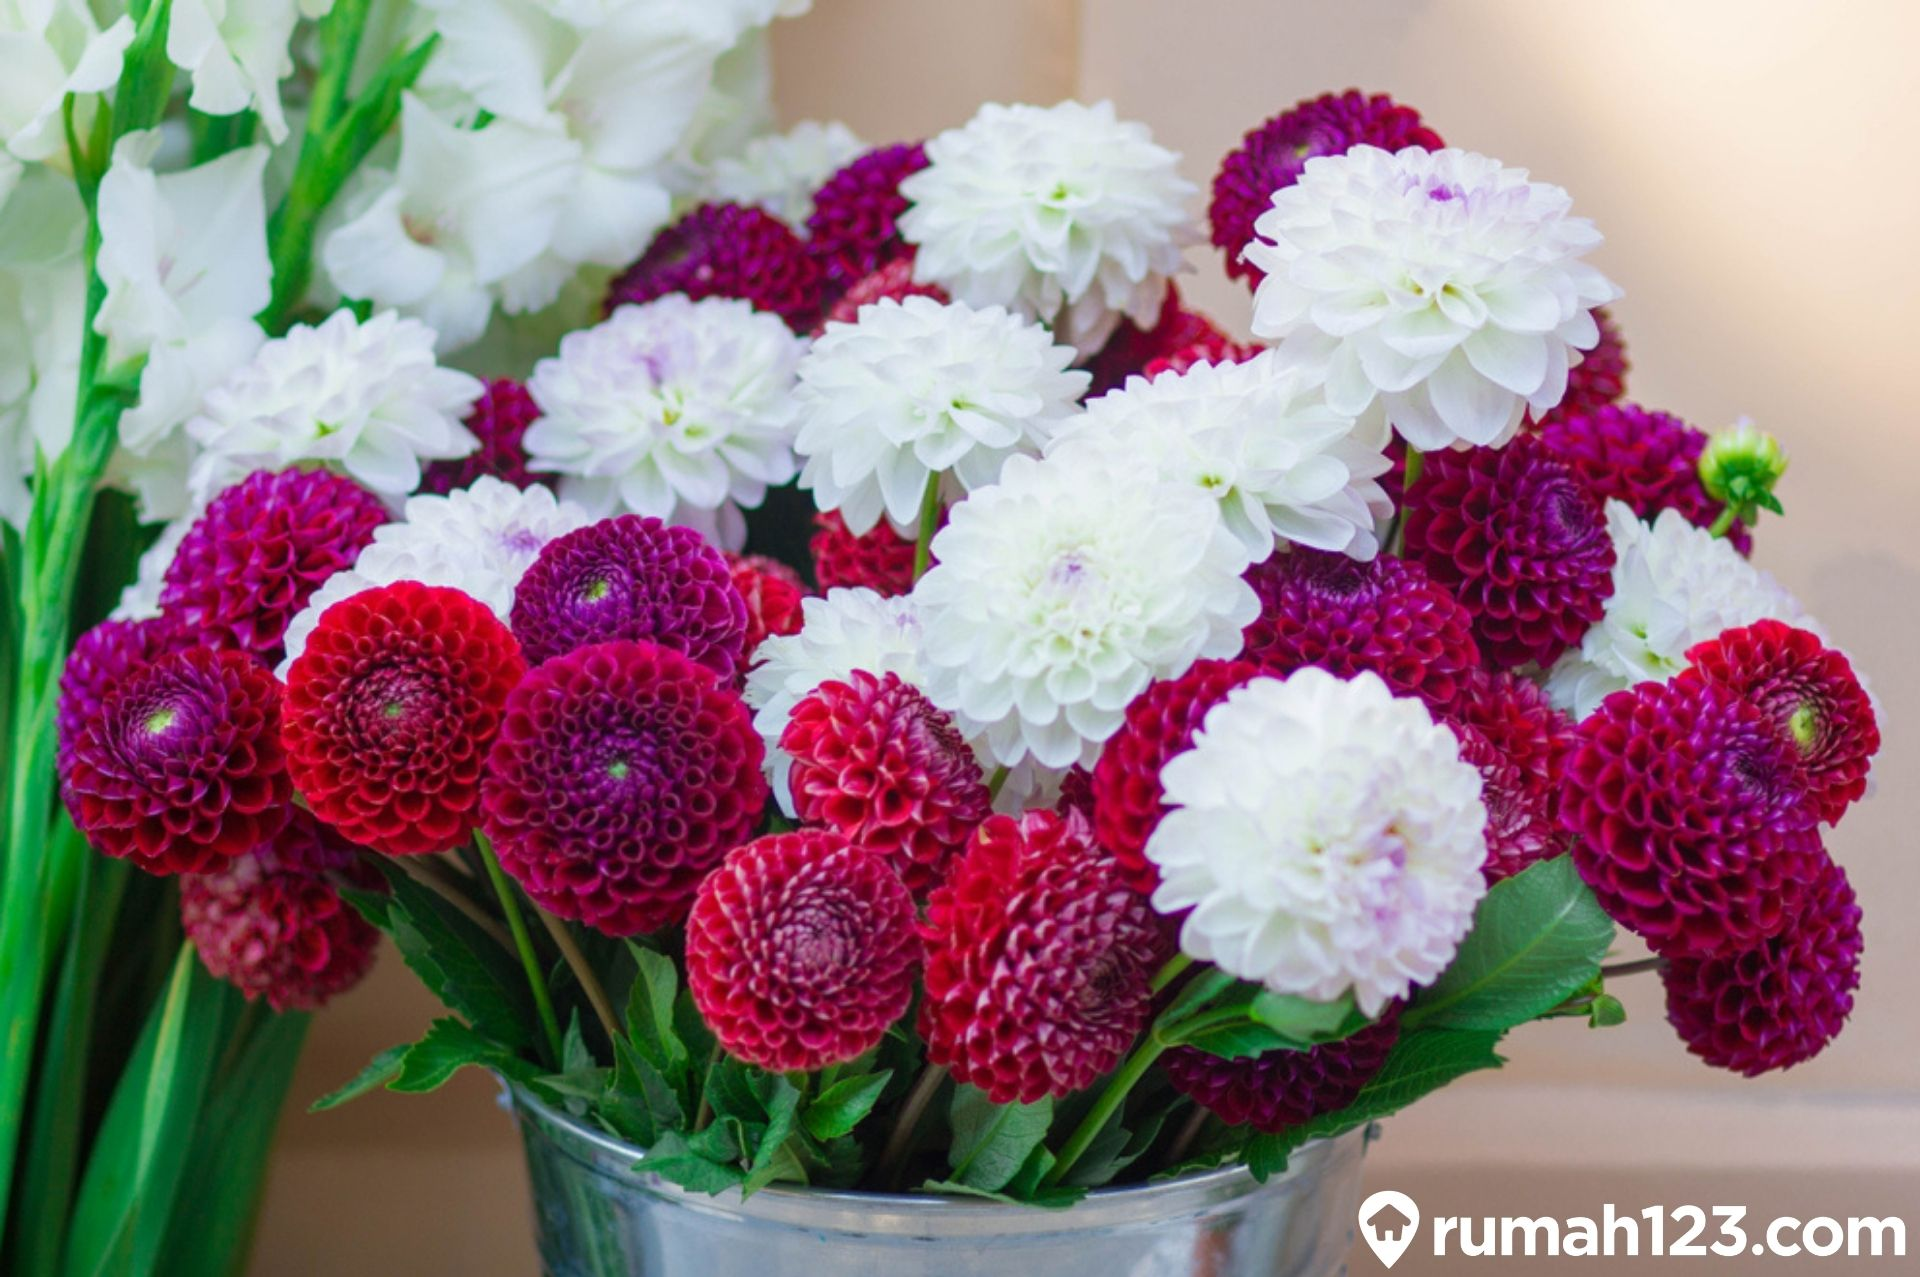 Panduan Lengkap Menanam Bunga Dahlia Dengan Mudah Di Rumah Rumah123 Com